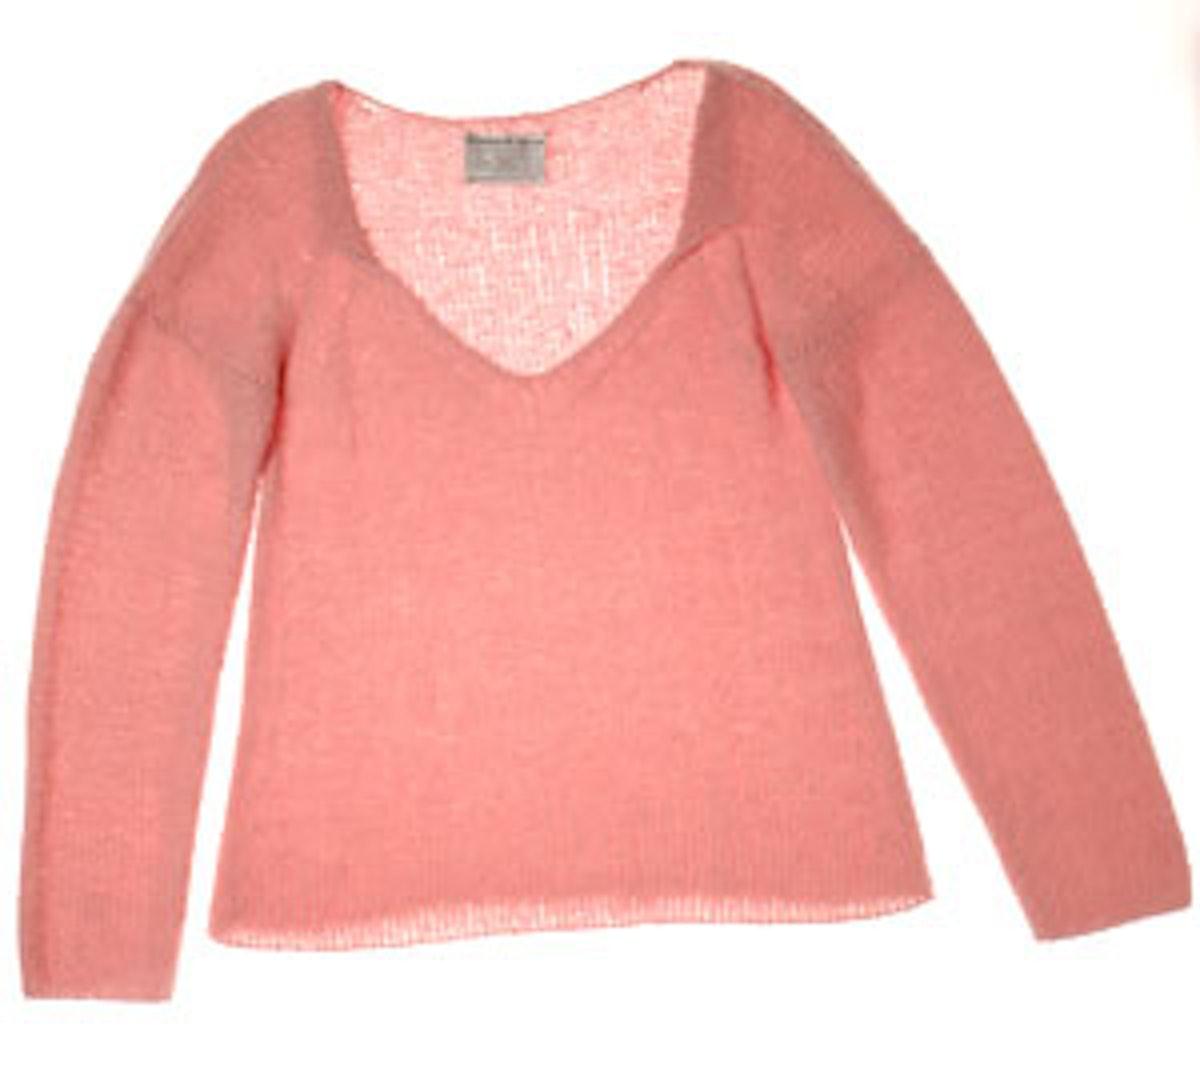 fass_sweater_02_v.jpg